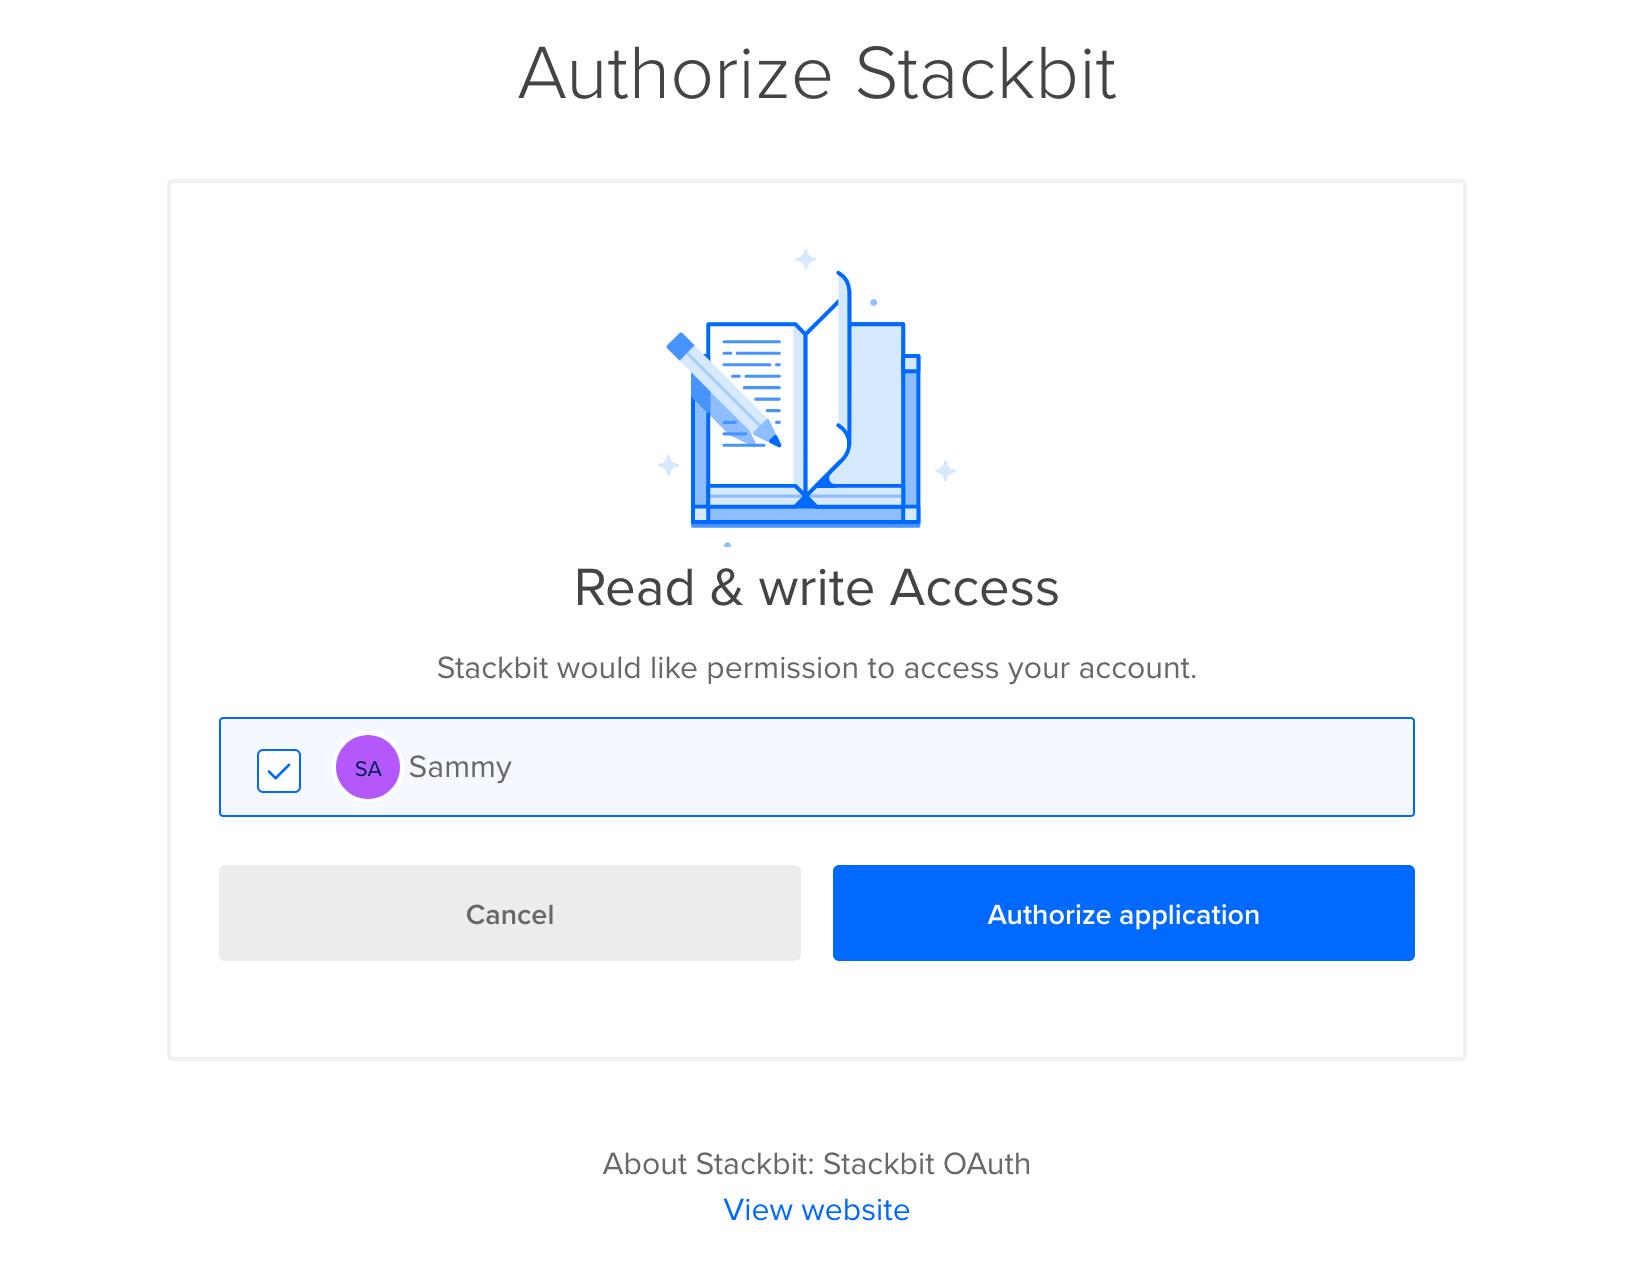 Authorize Stackbit